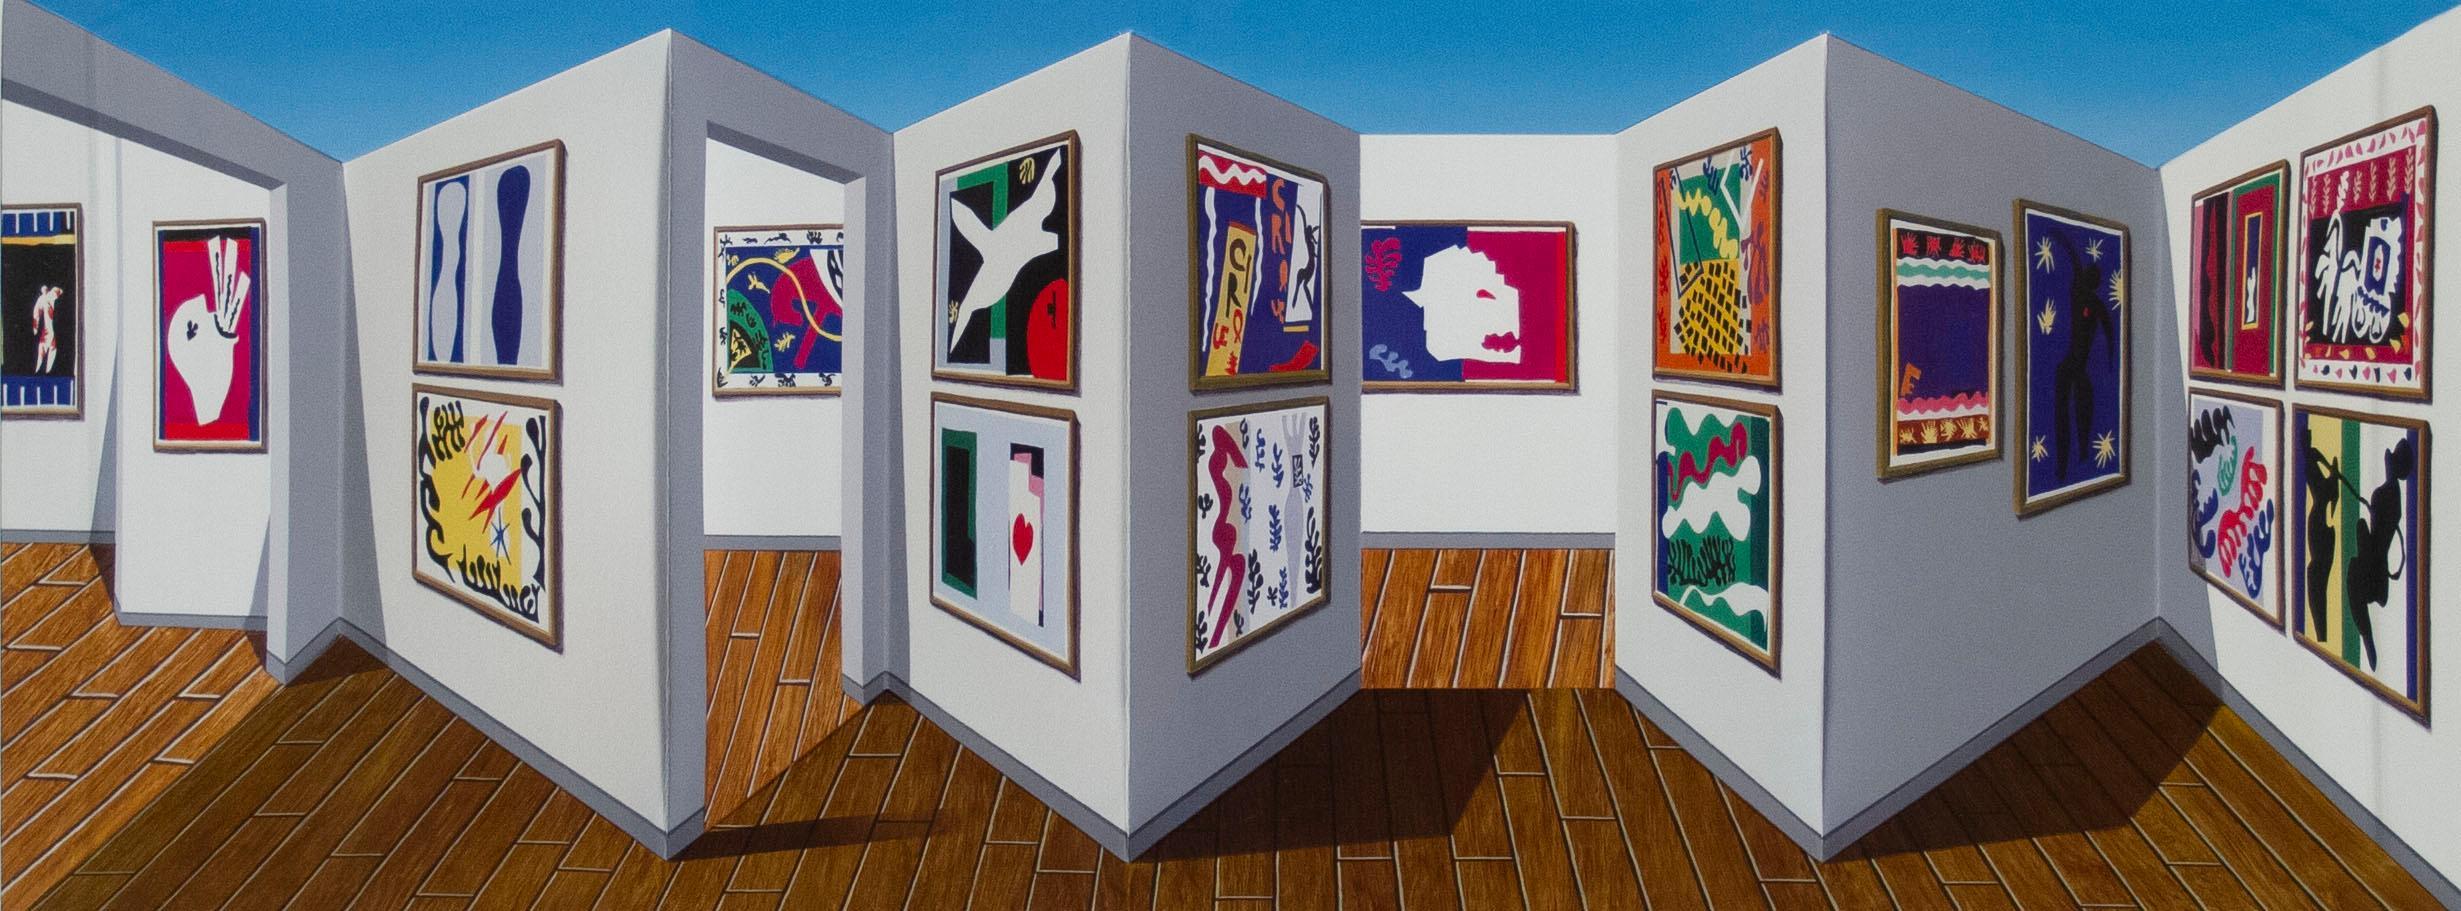 Patrick Hughes - Jazz, contemporary, op art, optical, reverspective, matisse